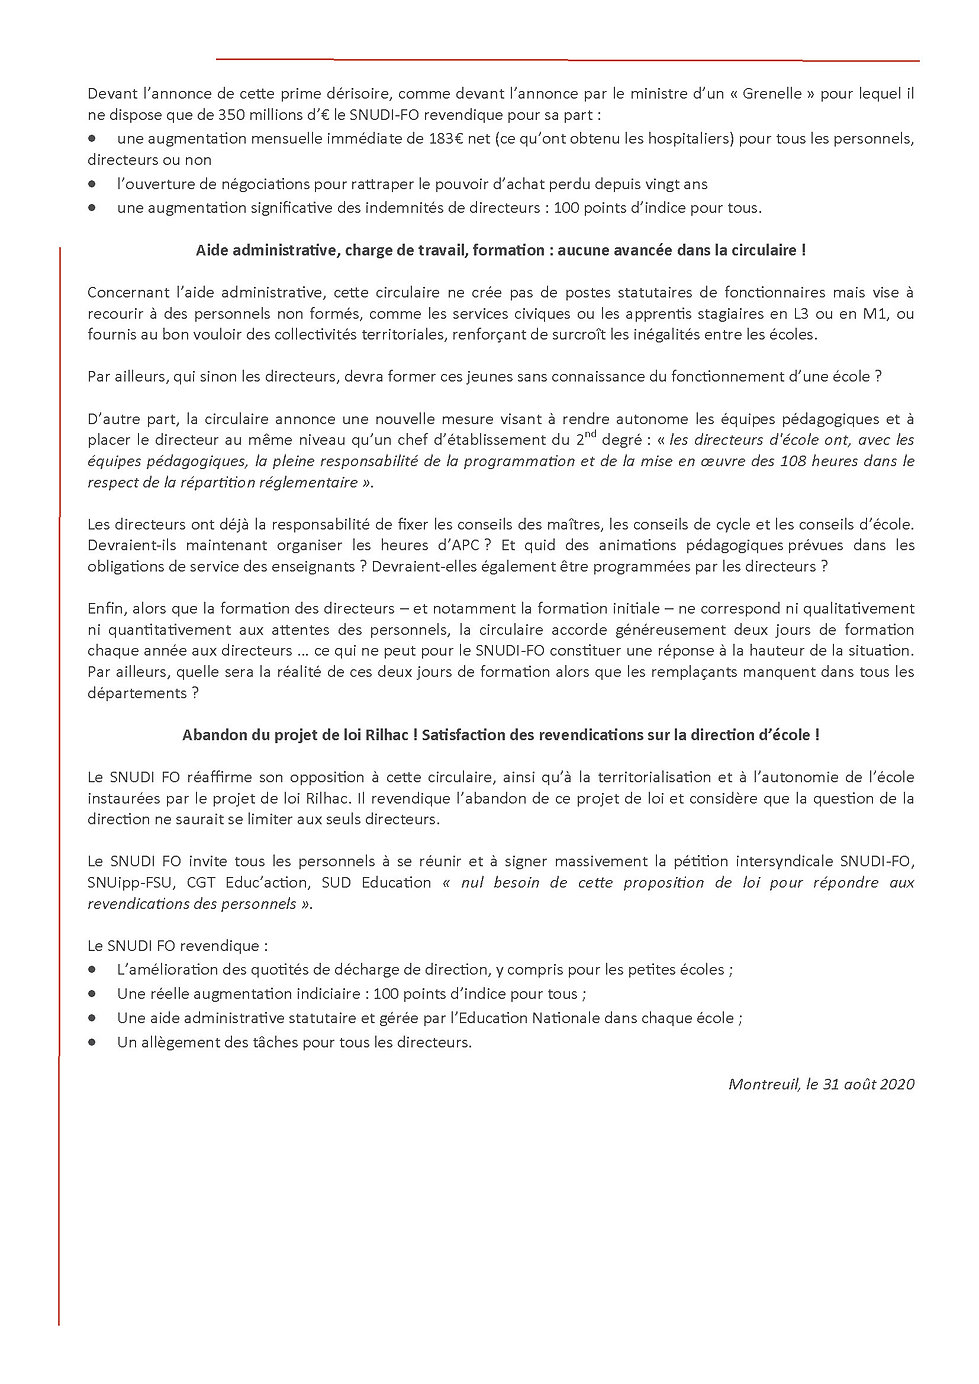 200831_Communiqué_SNUDI-FO_circulaire_d